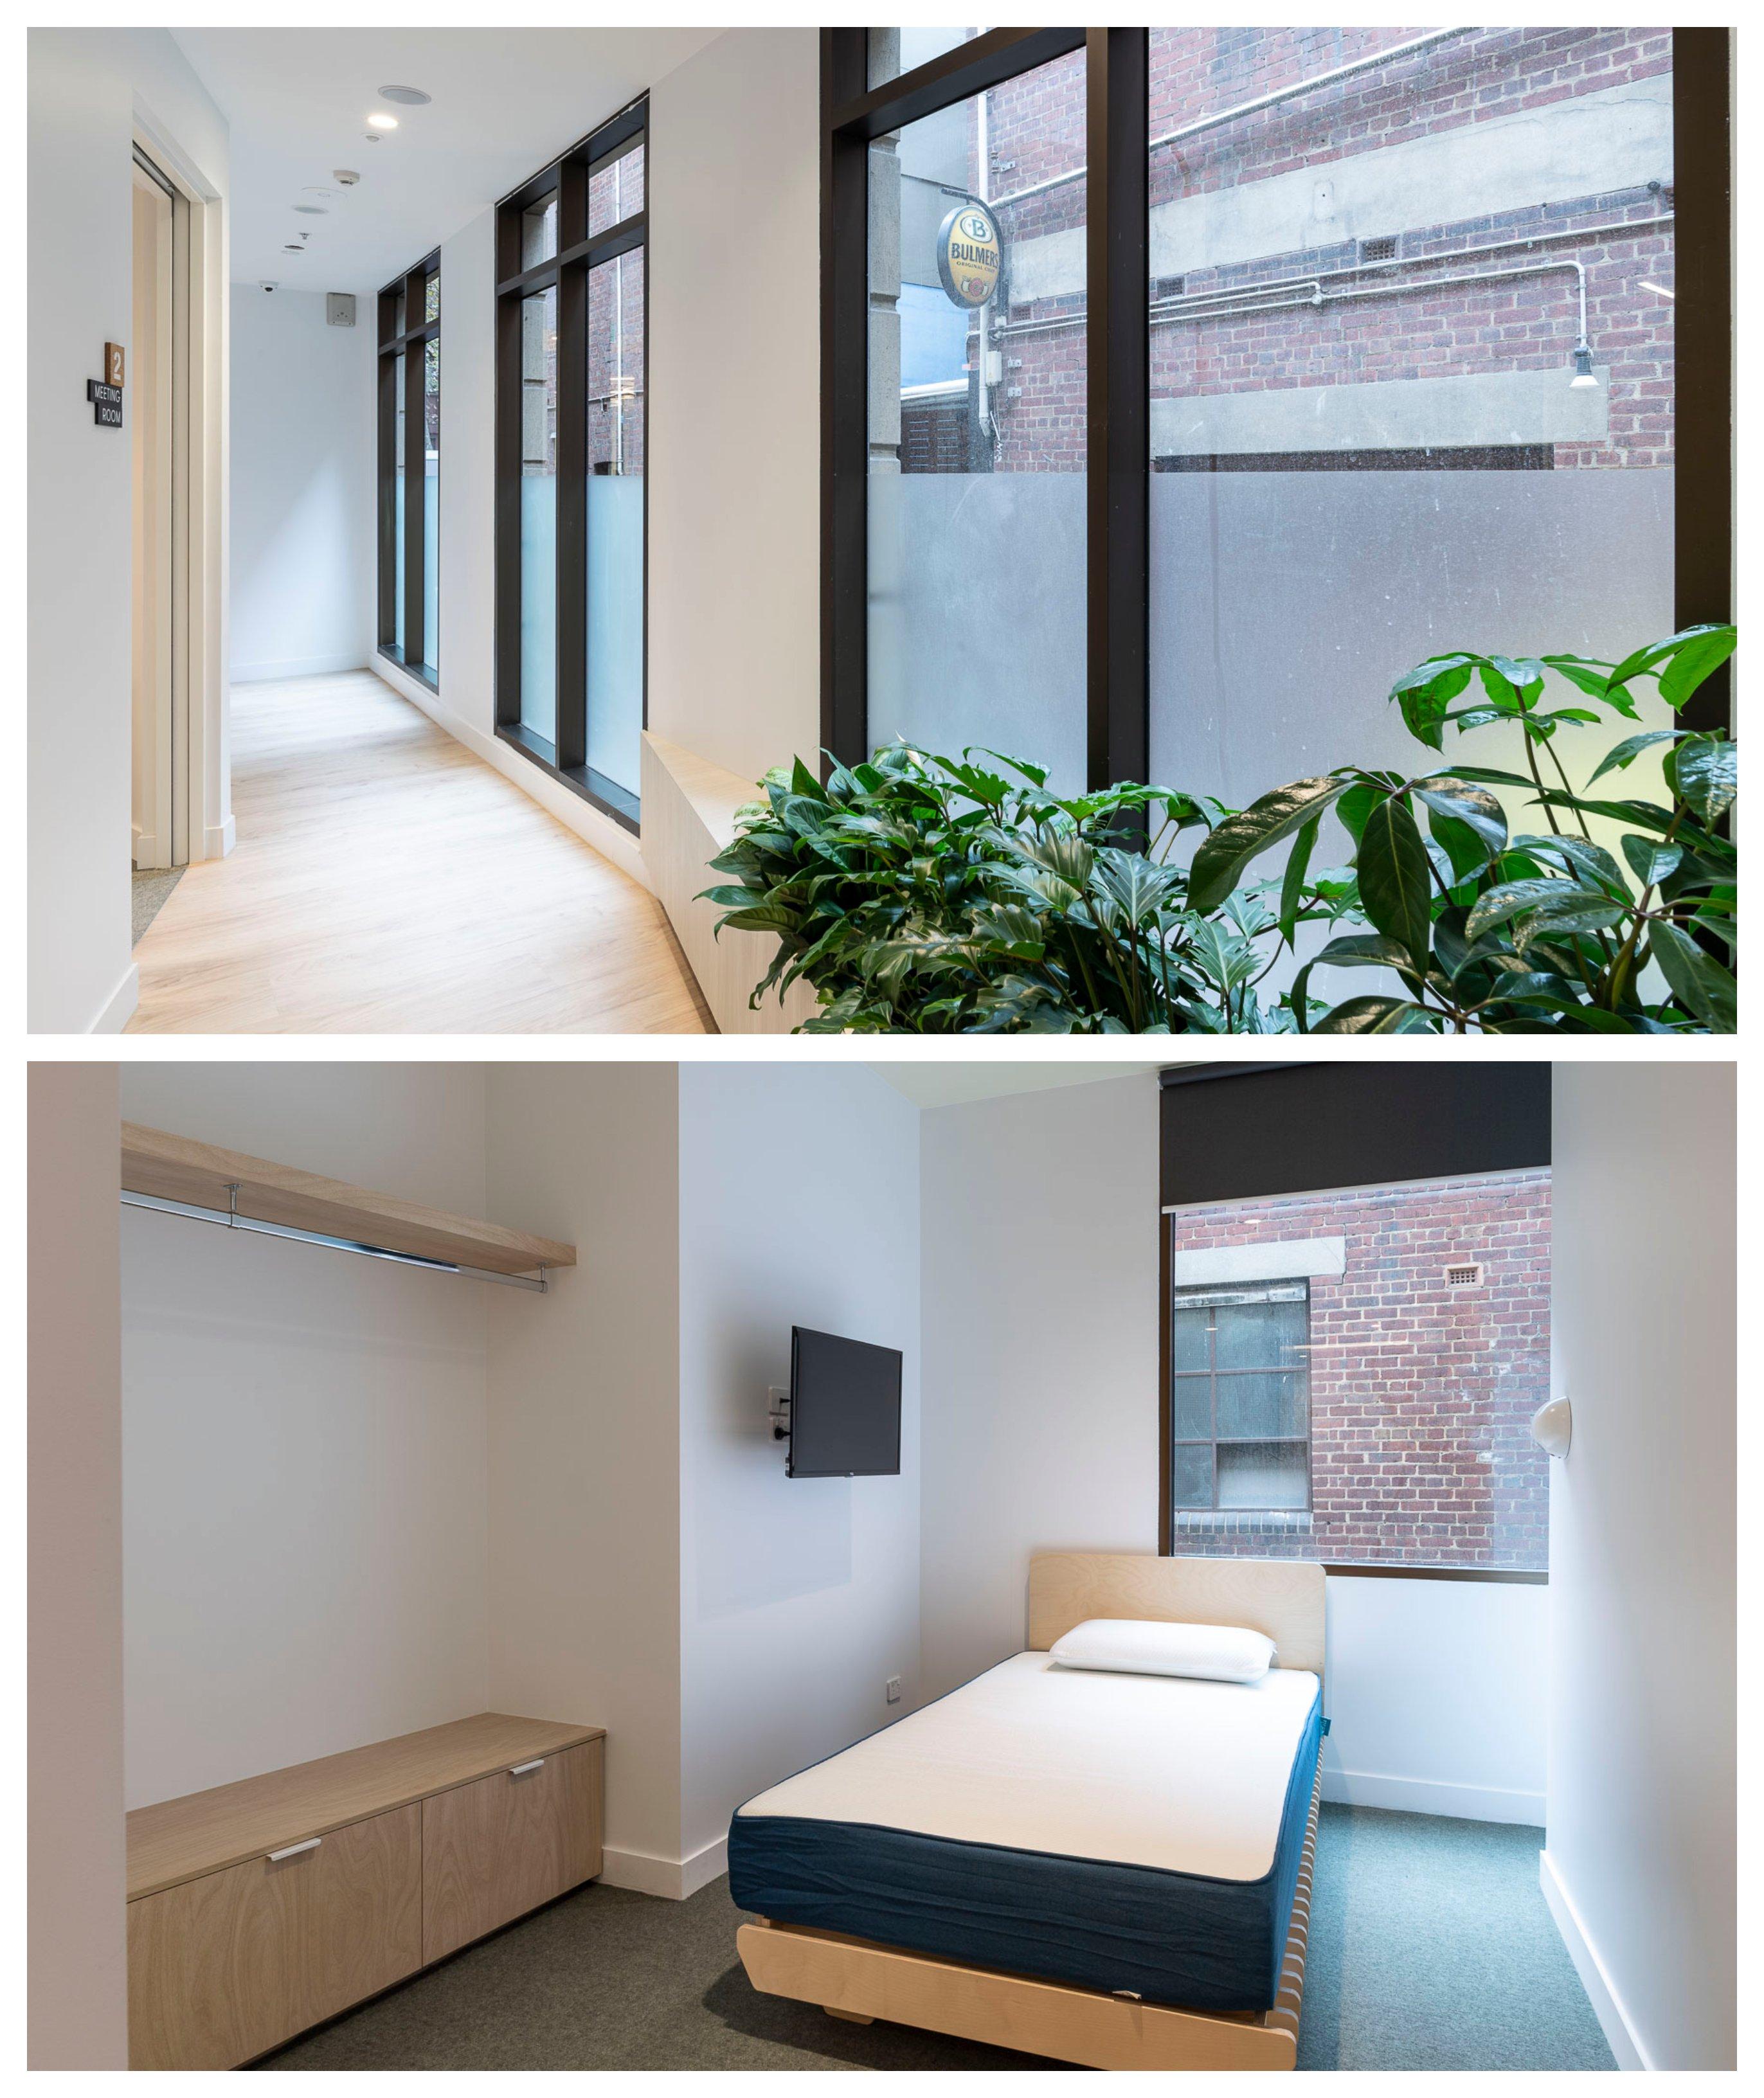 Internal living space at 19 King Street.